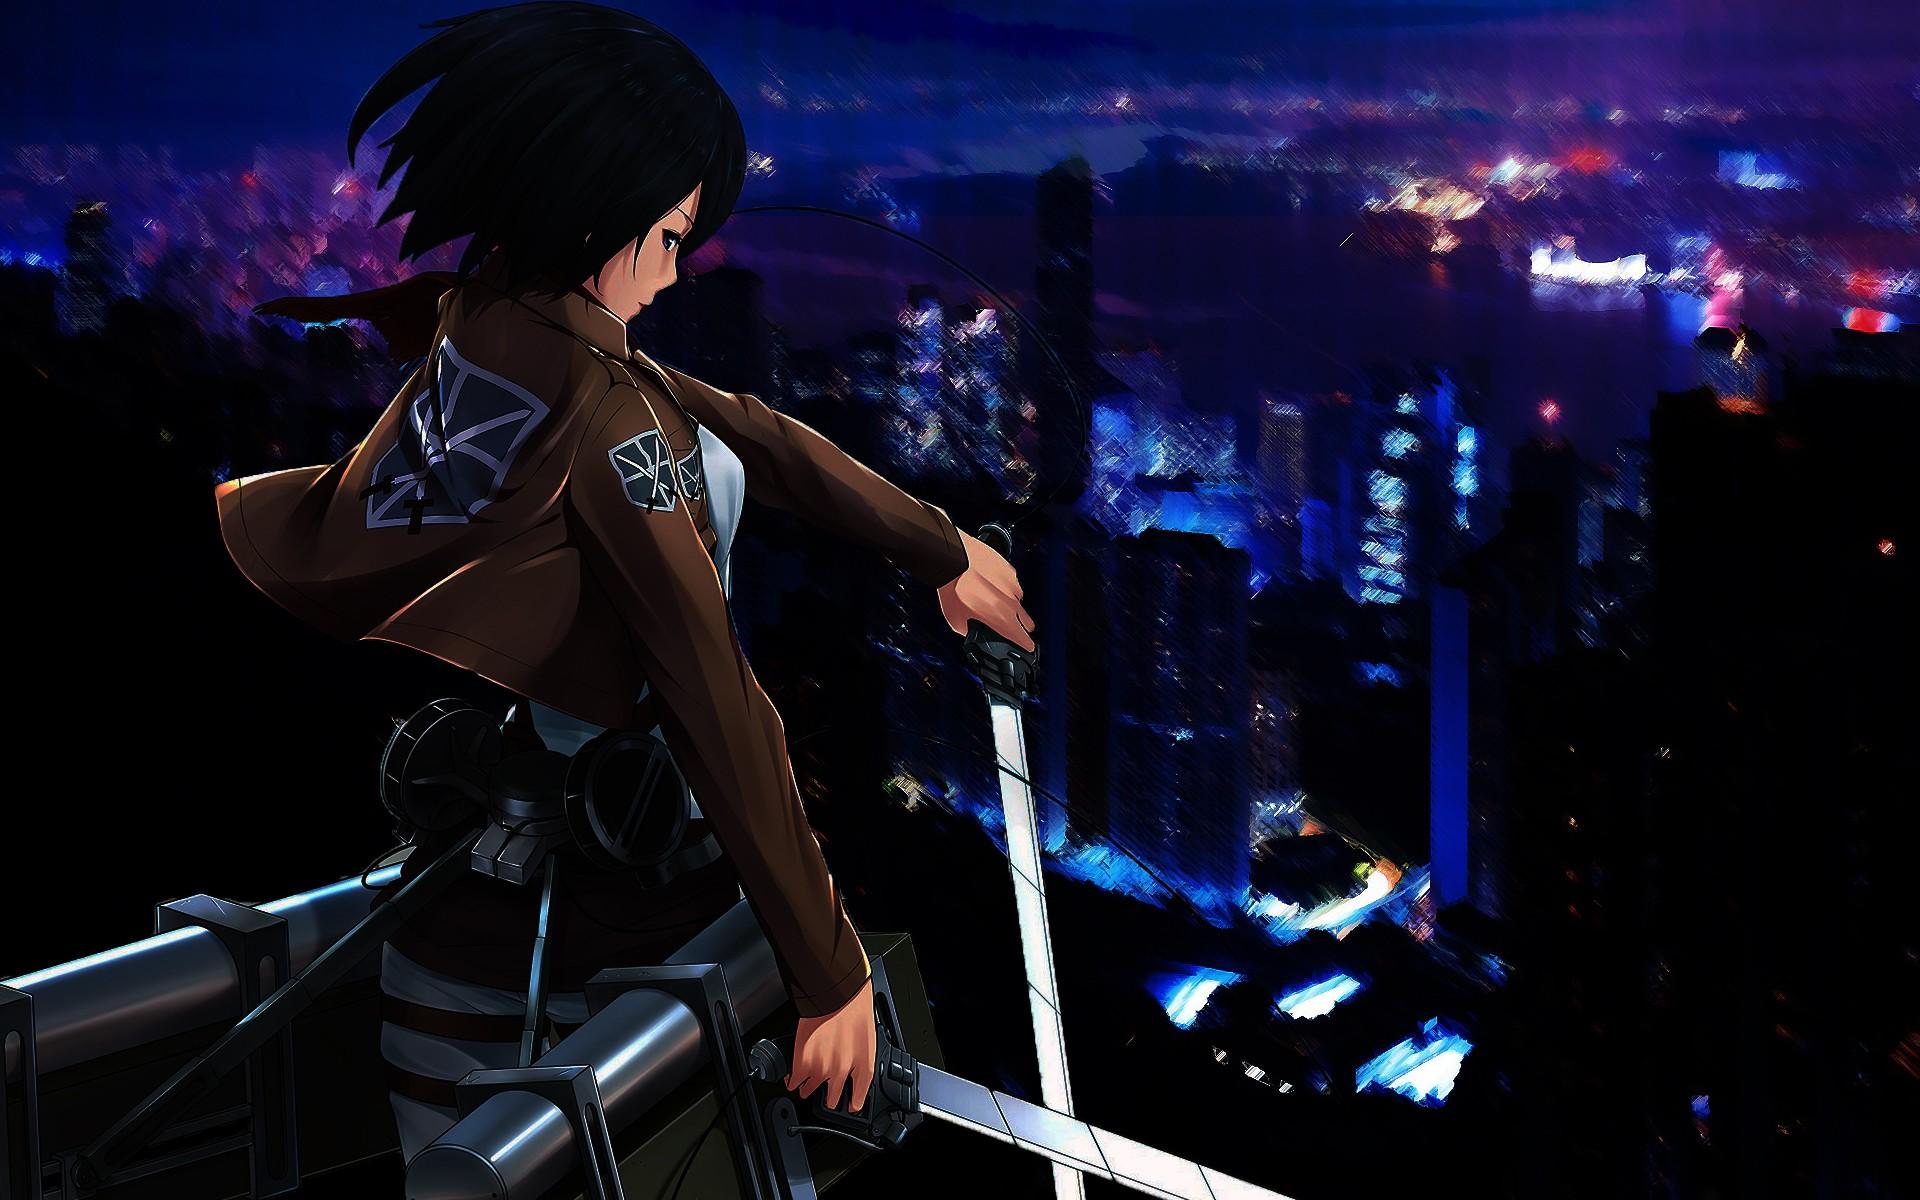 Fond d'écran : Art fantastique, Anime, Filles anime, ciel, Manga, Shingeki no Kyojin, Mikasa ...